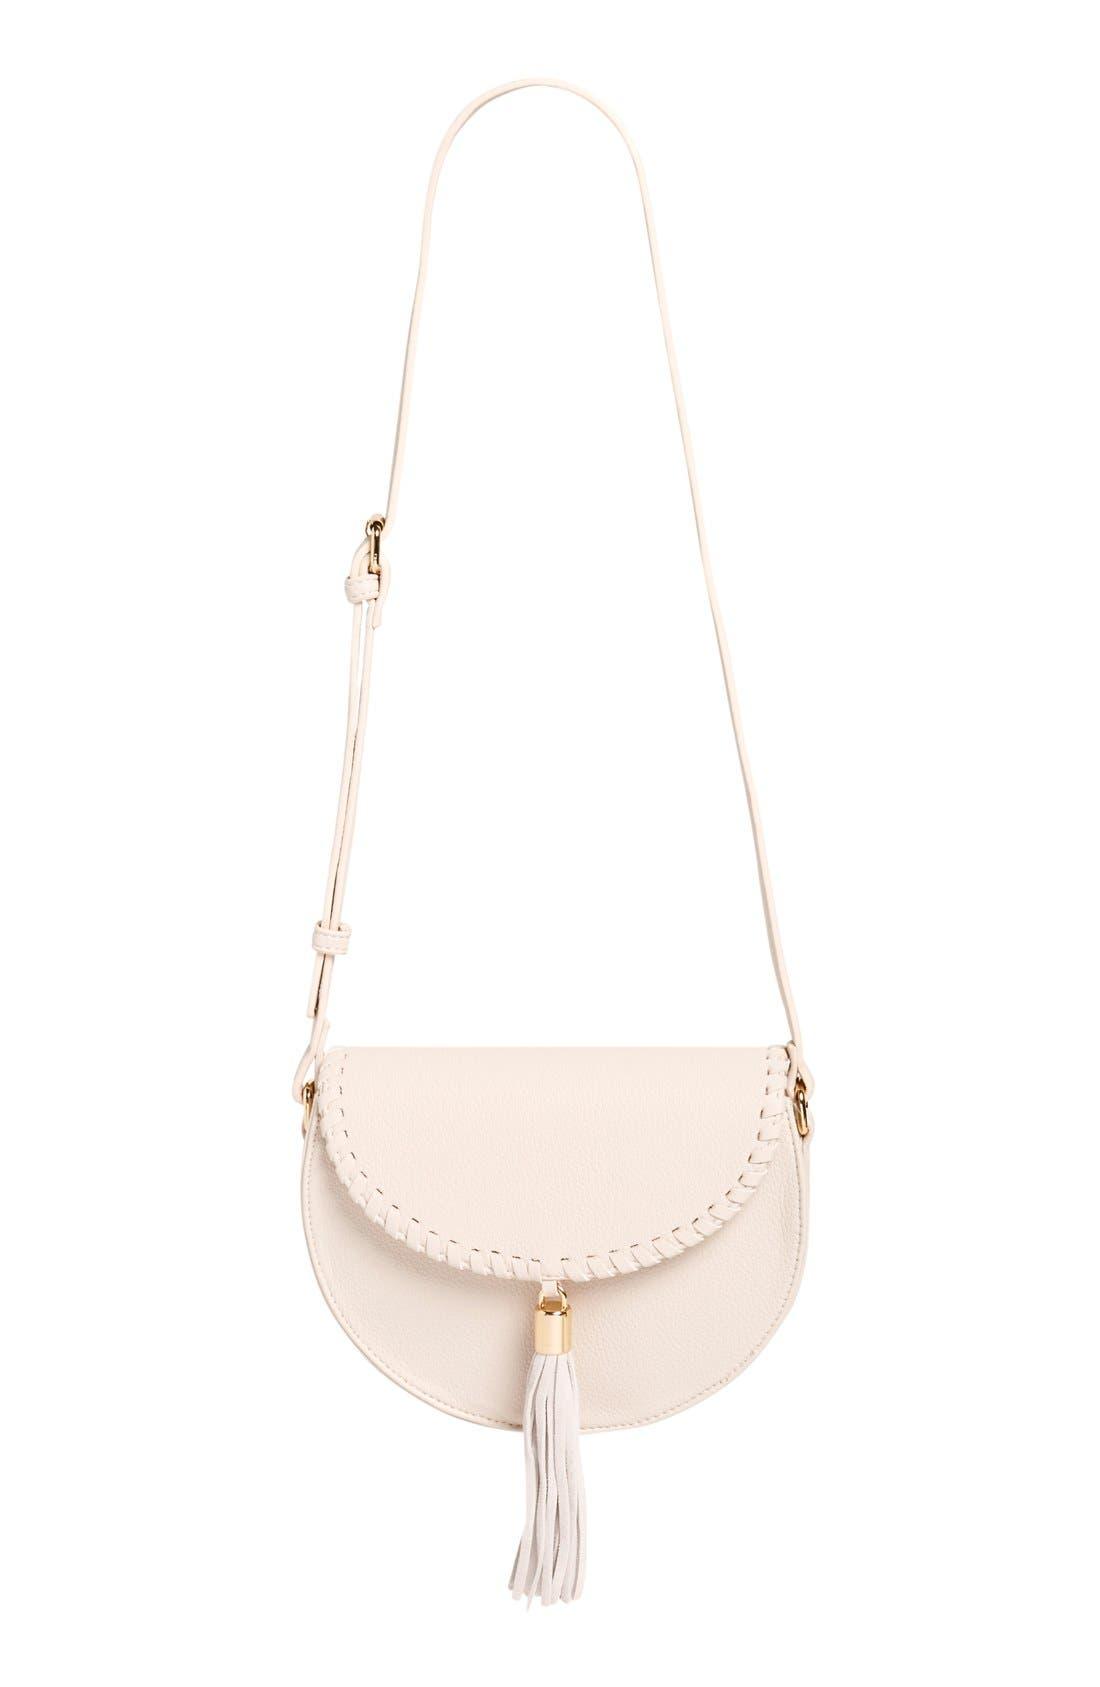 Alternate Image 1 Selected - Street Level Tassel Flap Crossbody Bag